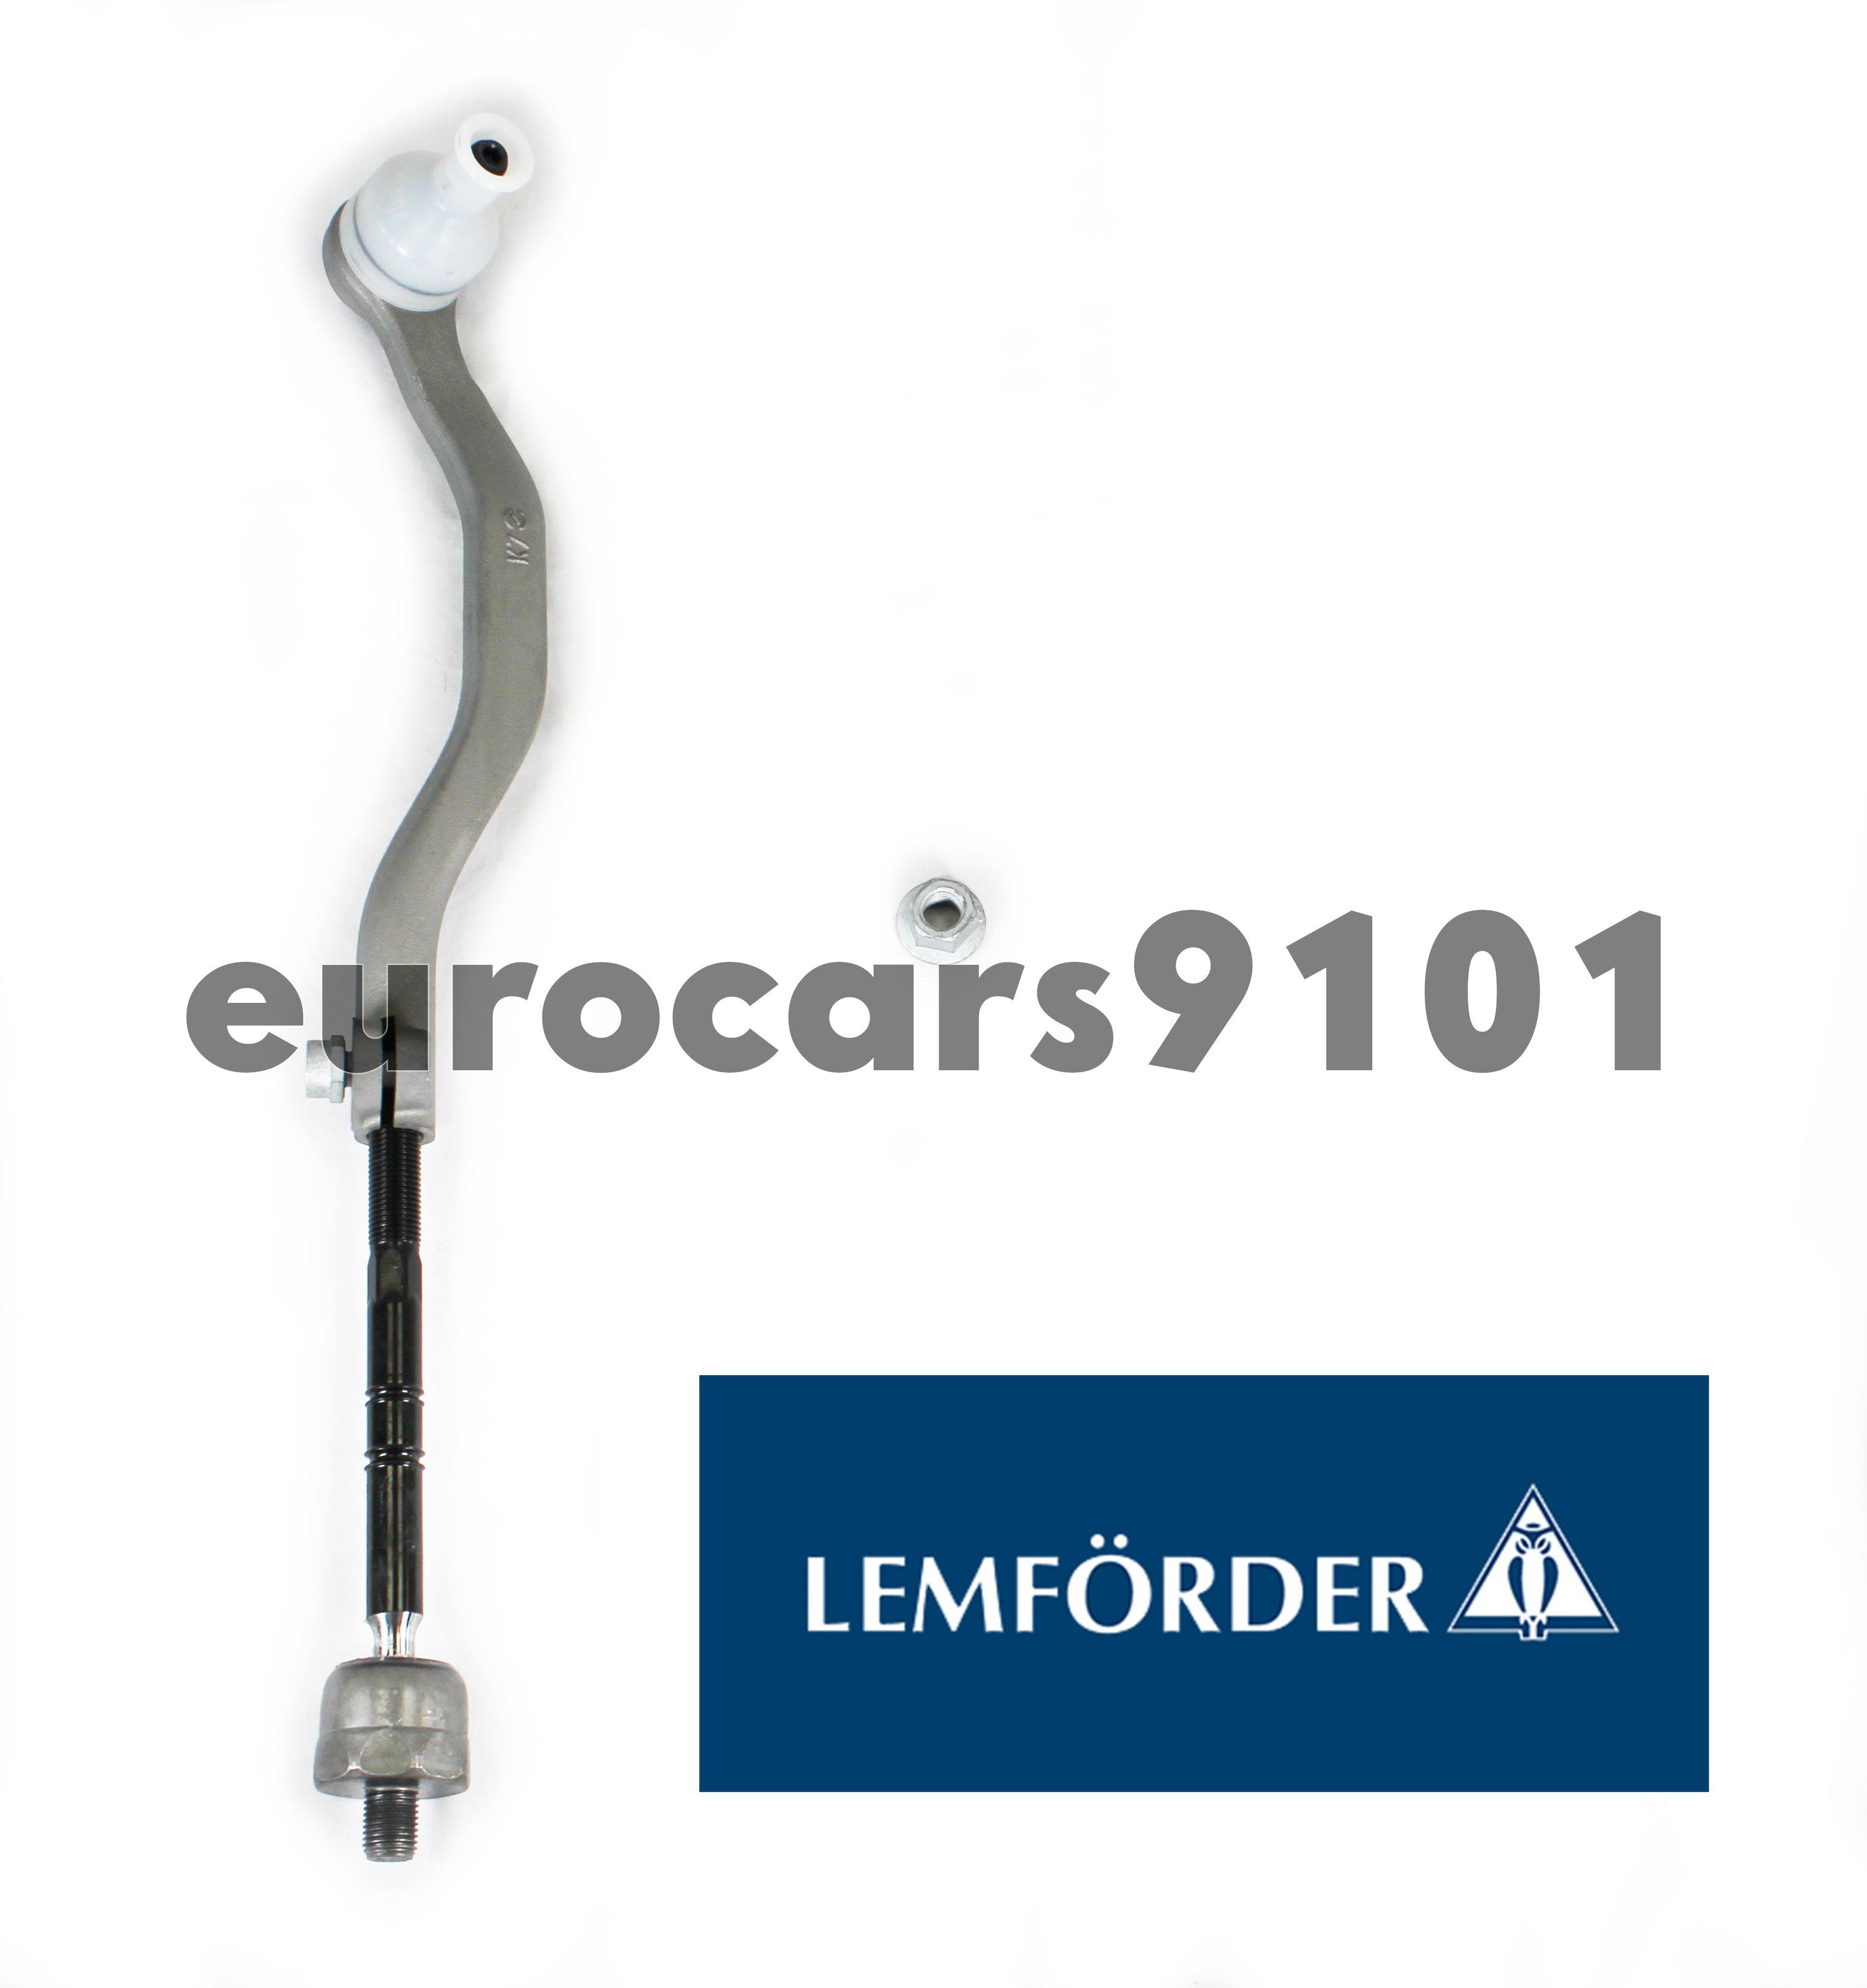 Mini Cooper 2003 2004 2005 2006 2007 2008 Lemfoerder Tie Rod Assembly